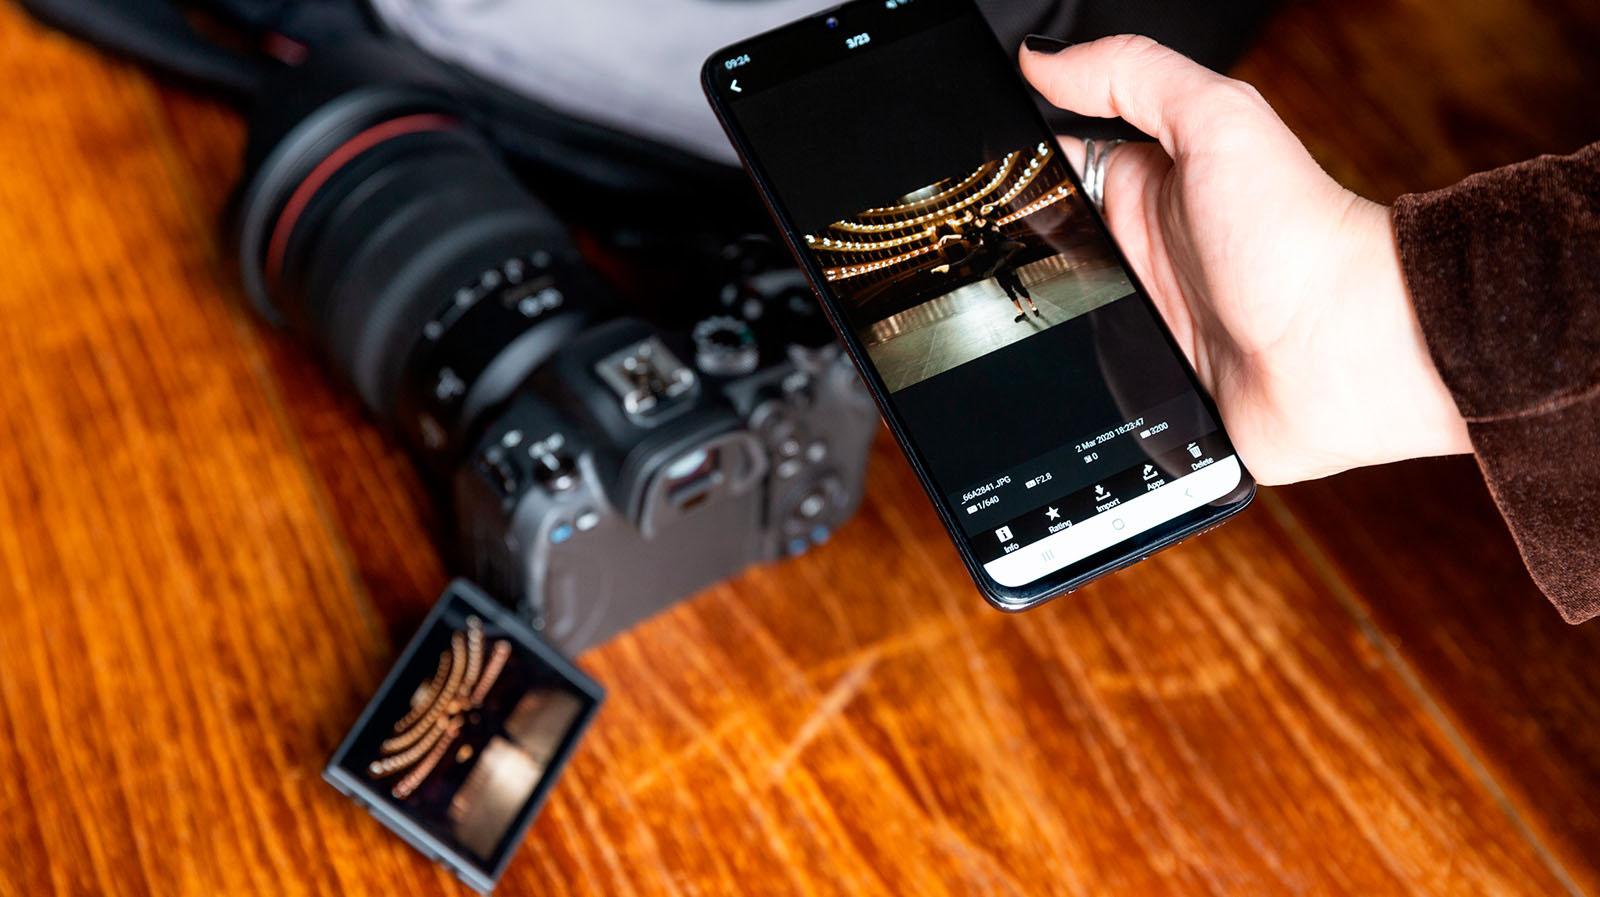 R6 smartphone control